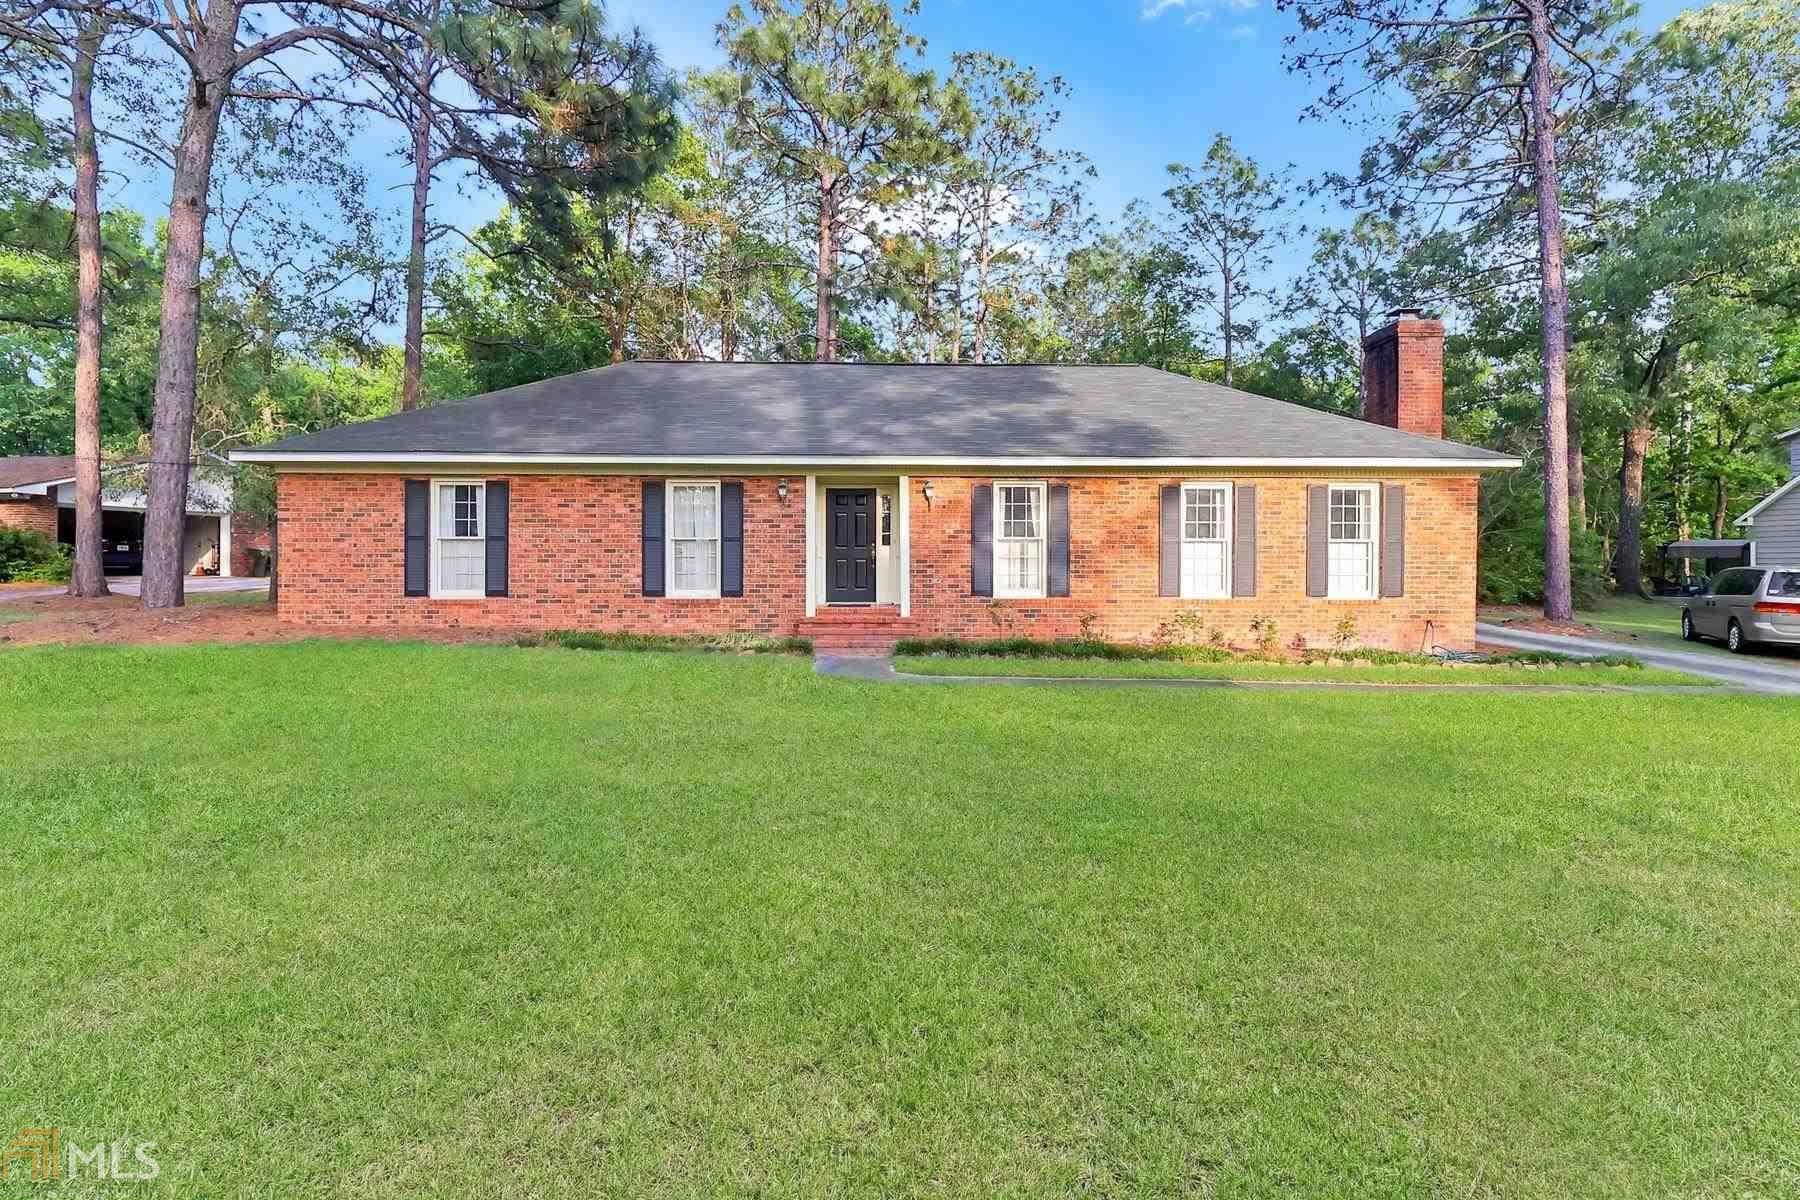 310 Meadowlark Cir, Statesboro, GA 30461 - #: 8970324